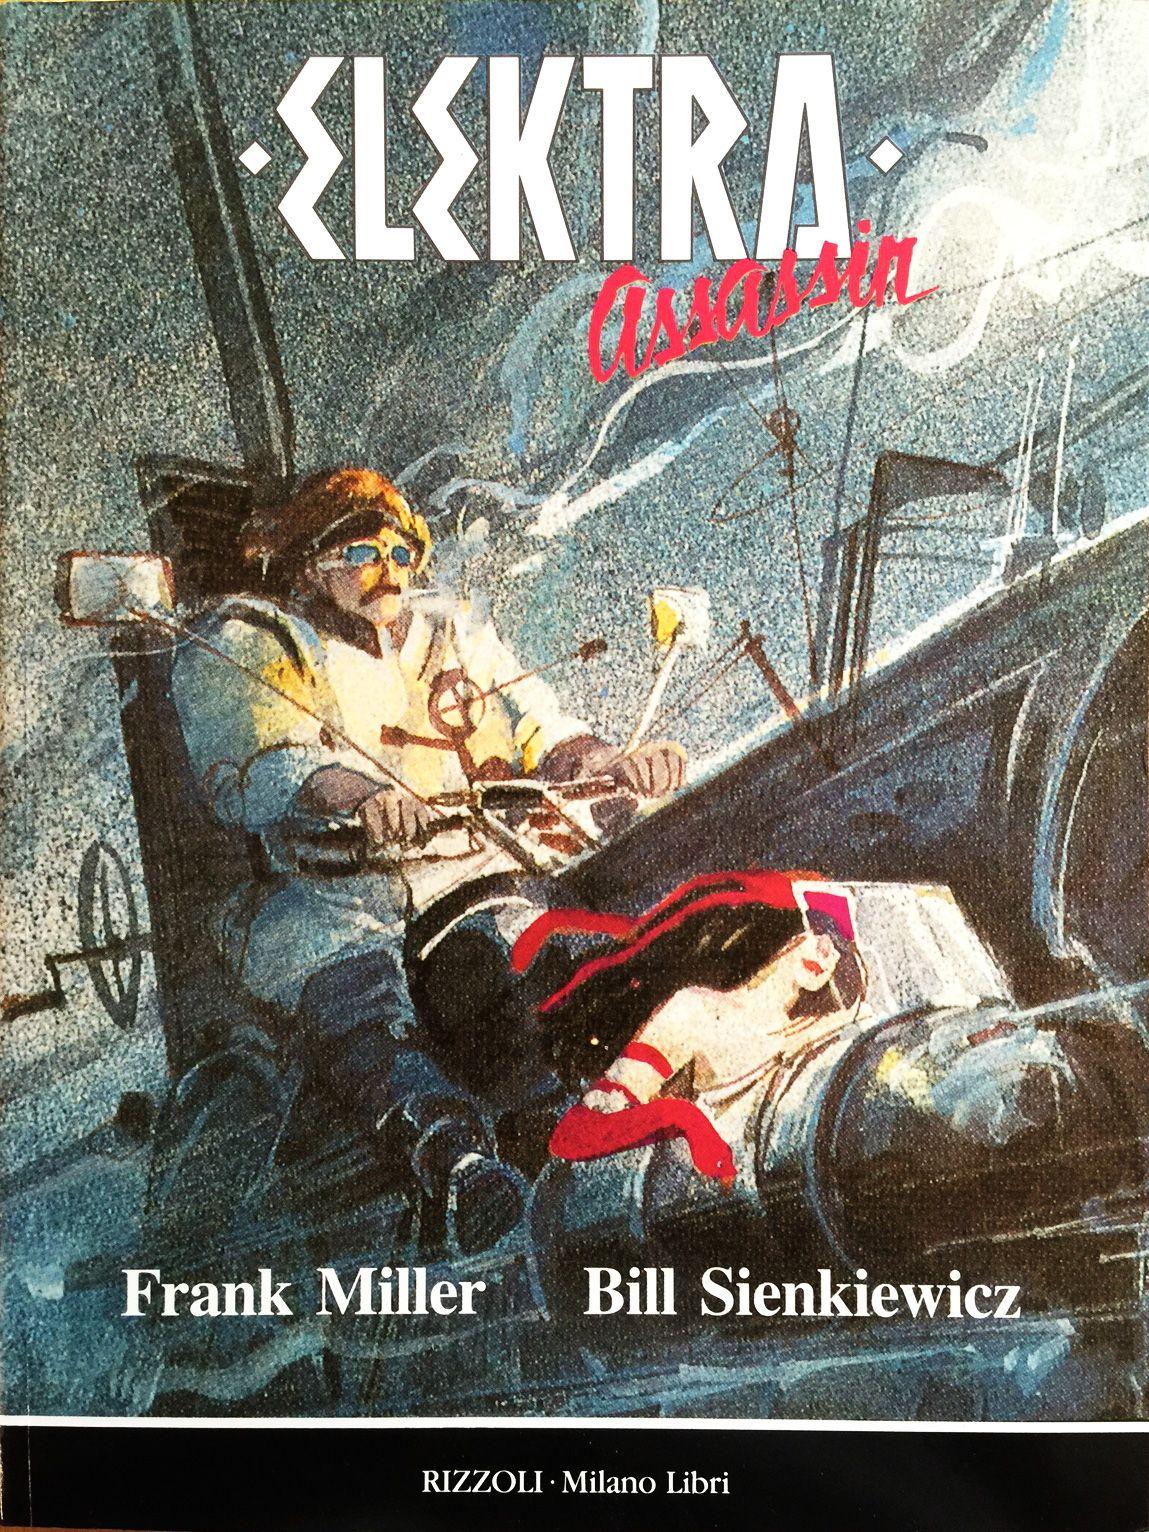 "Frank Miller (storia) & Bill Sienkiewicz (disegni) ""Elektra Assassin"" _ Rizzoli - Milano Libri, novembre 1991"